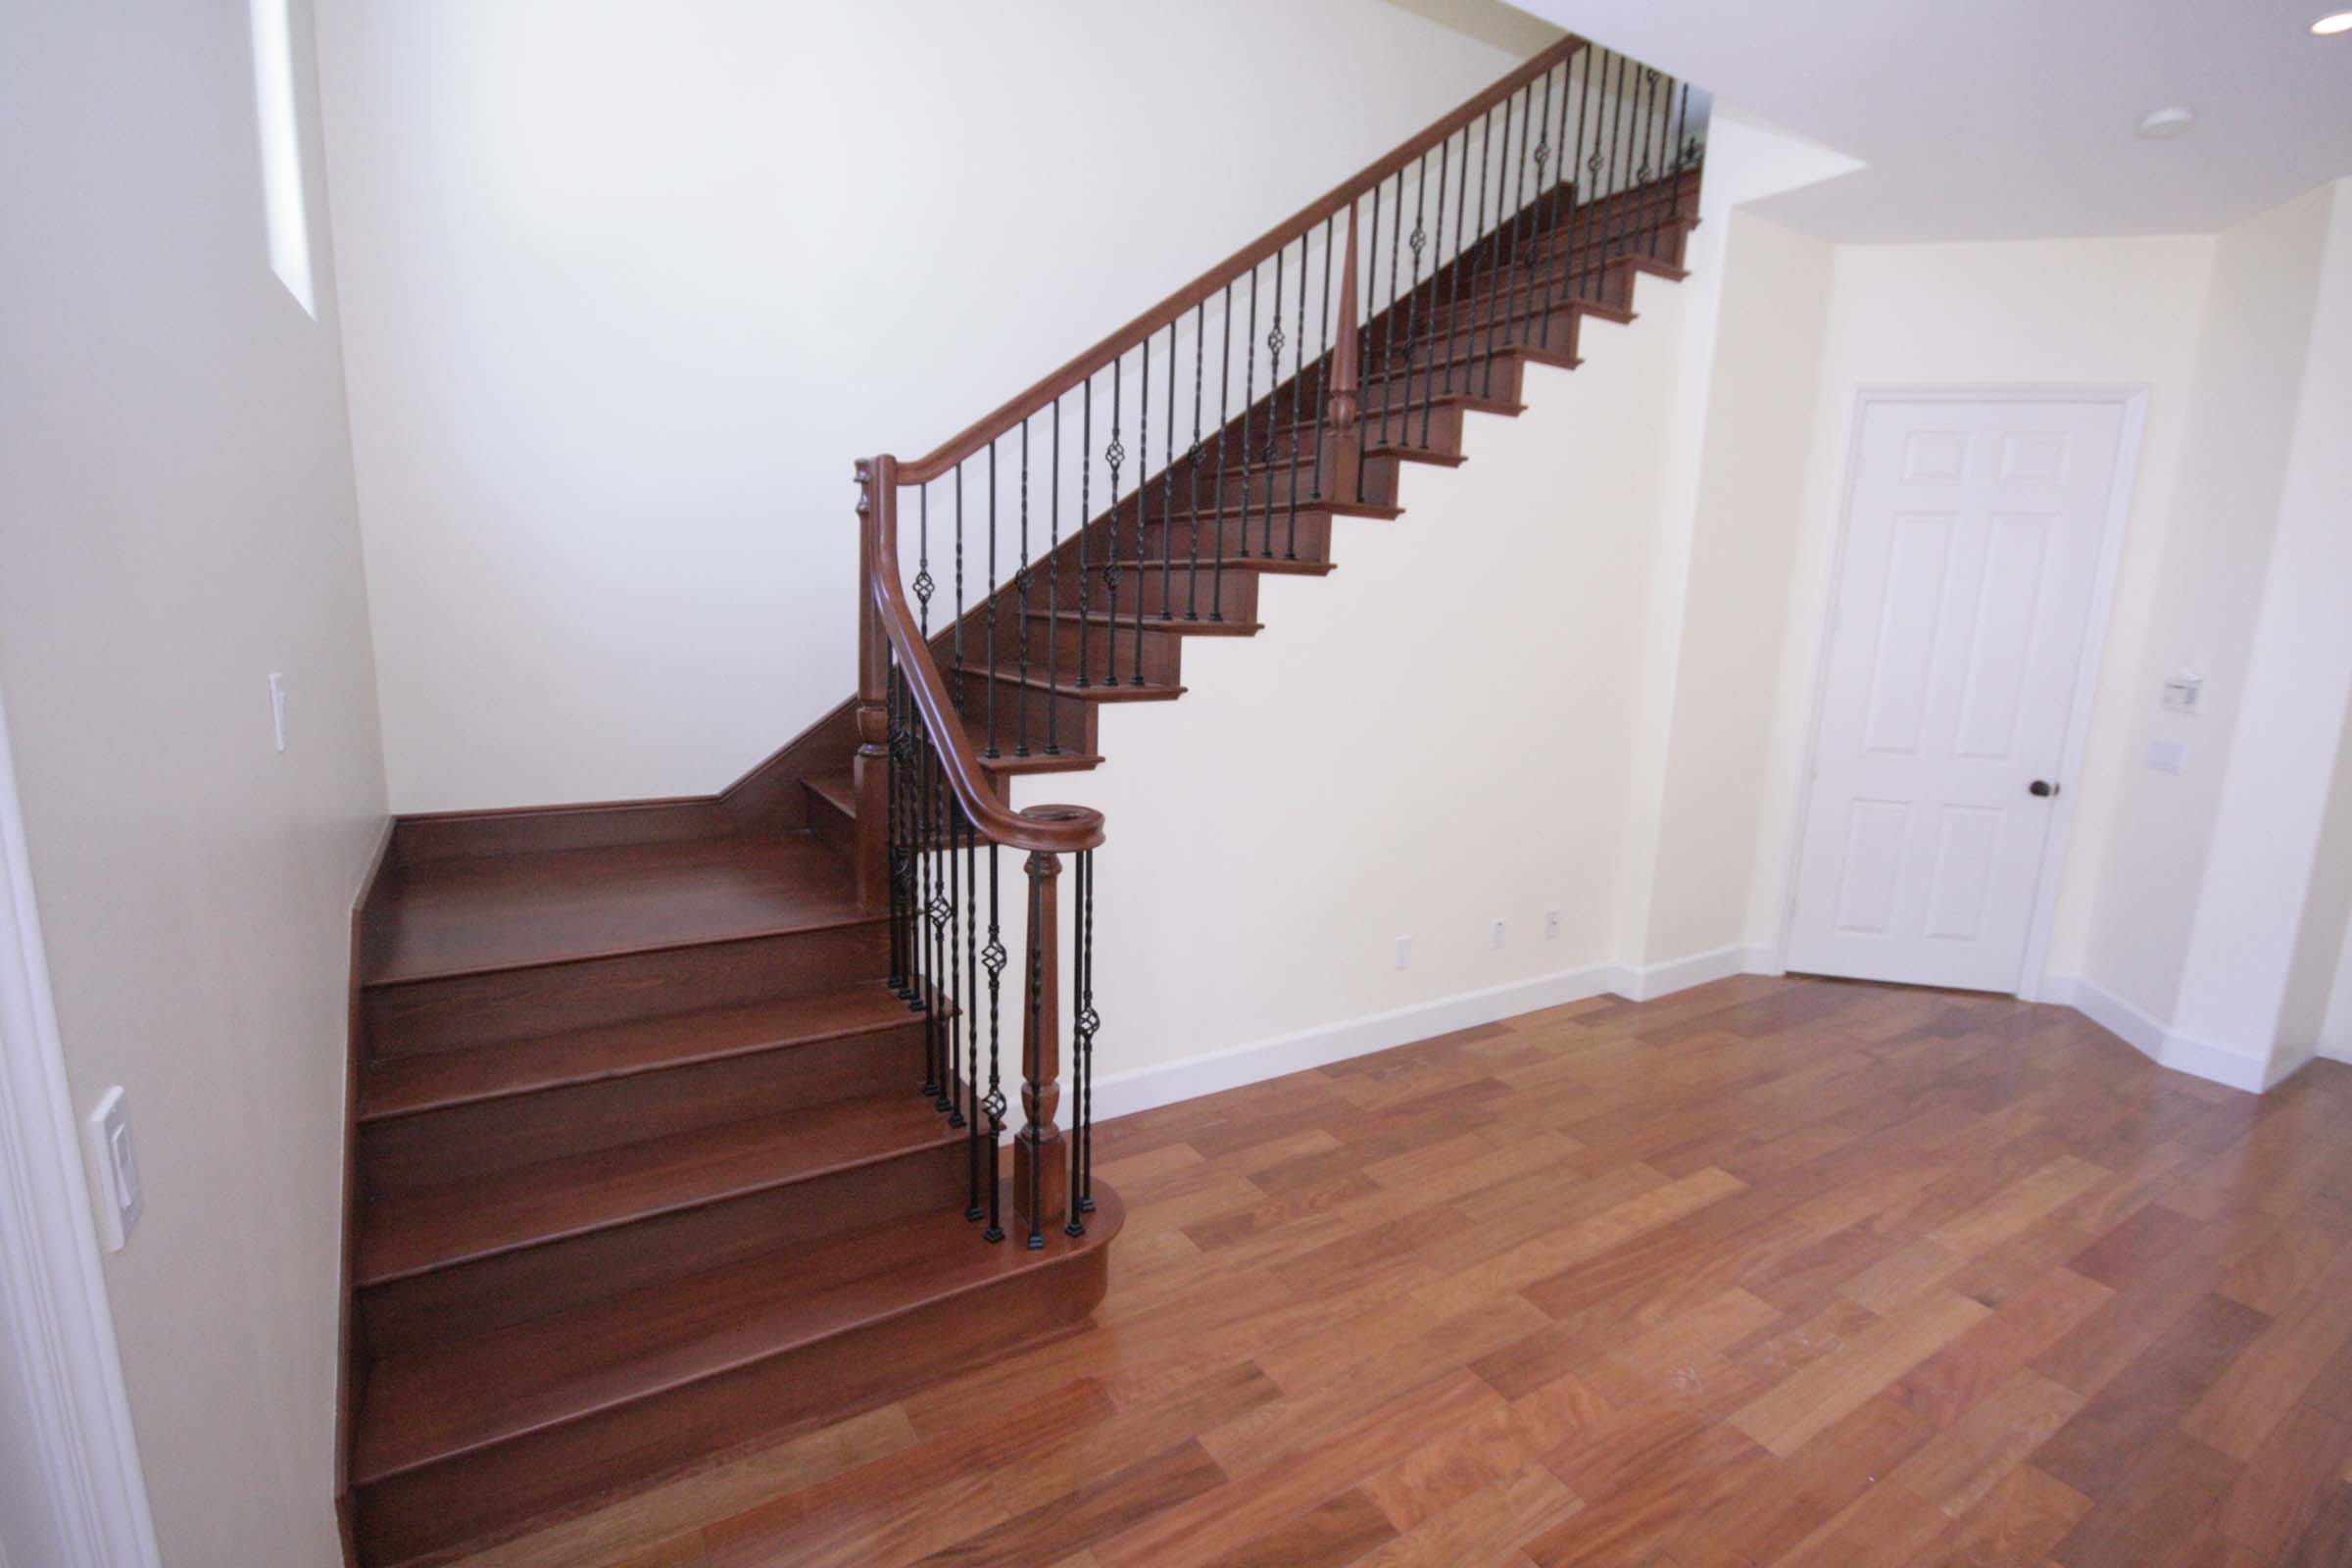 - Santa Luz Stairs